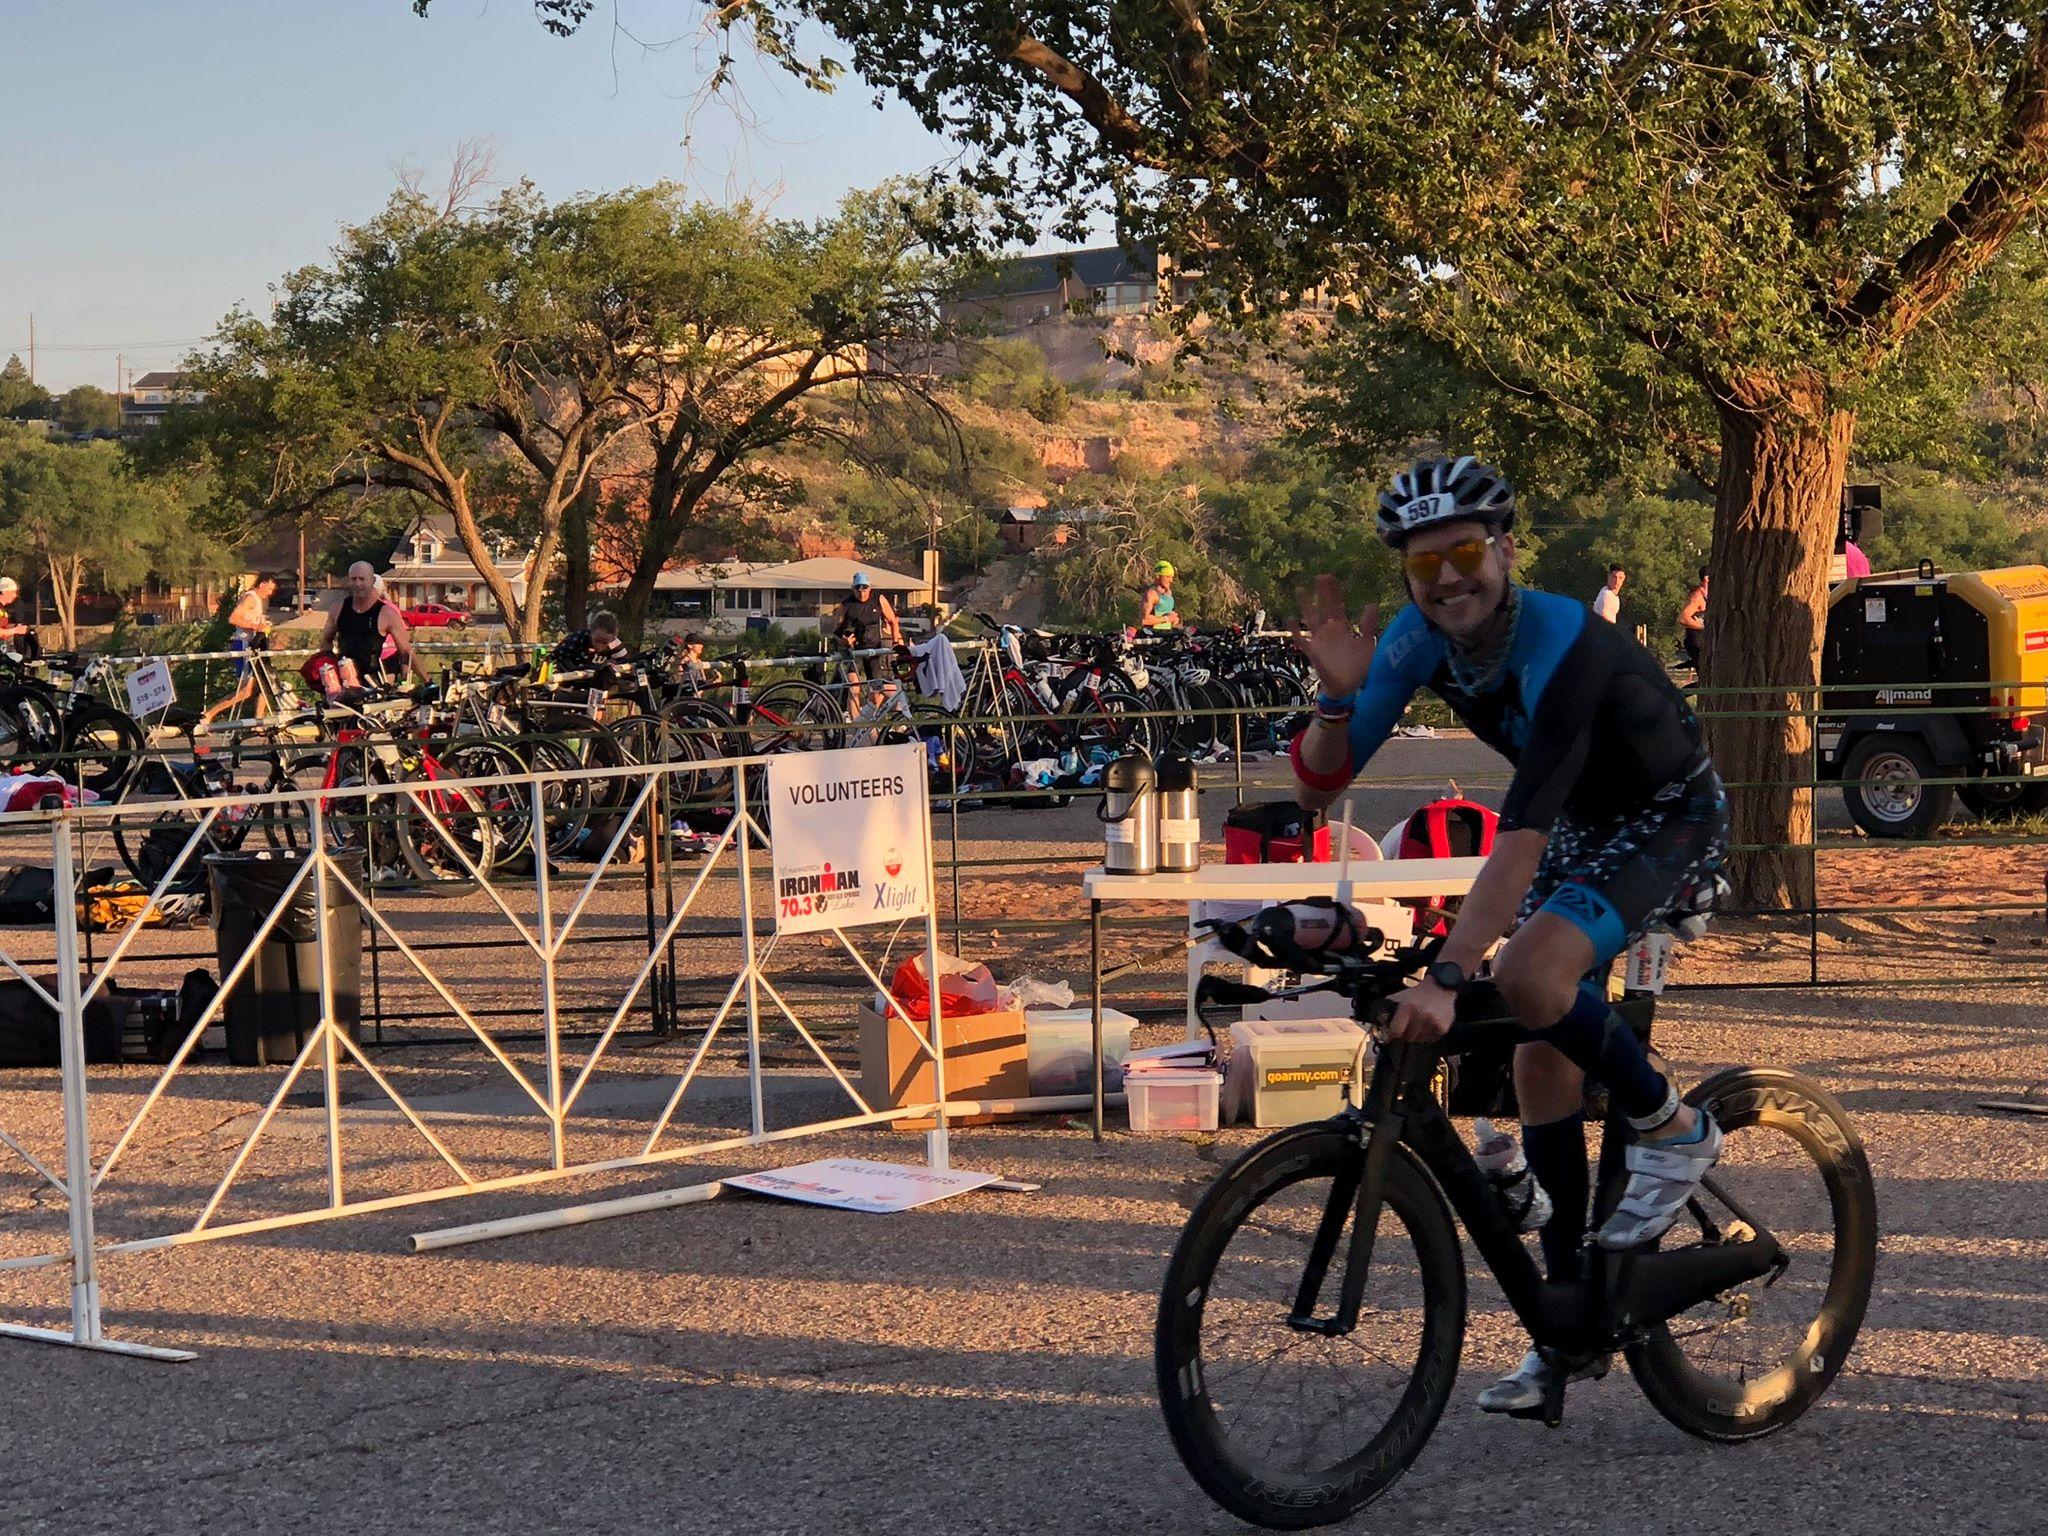 Coach_Terry_Wilson_Pursuit_of_The_Perfect_Race_IRONMAN_Buffalo_Springs_Lake_70.3_Mark_Clee_Bike.jpg